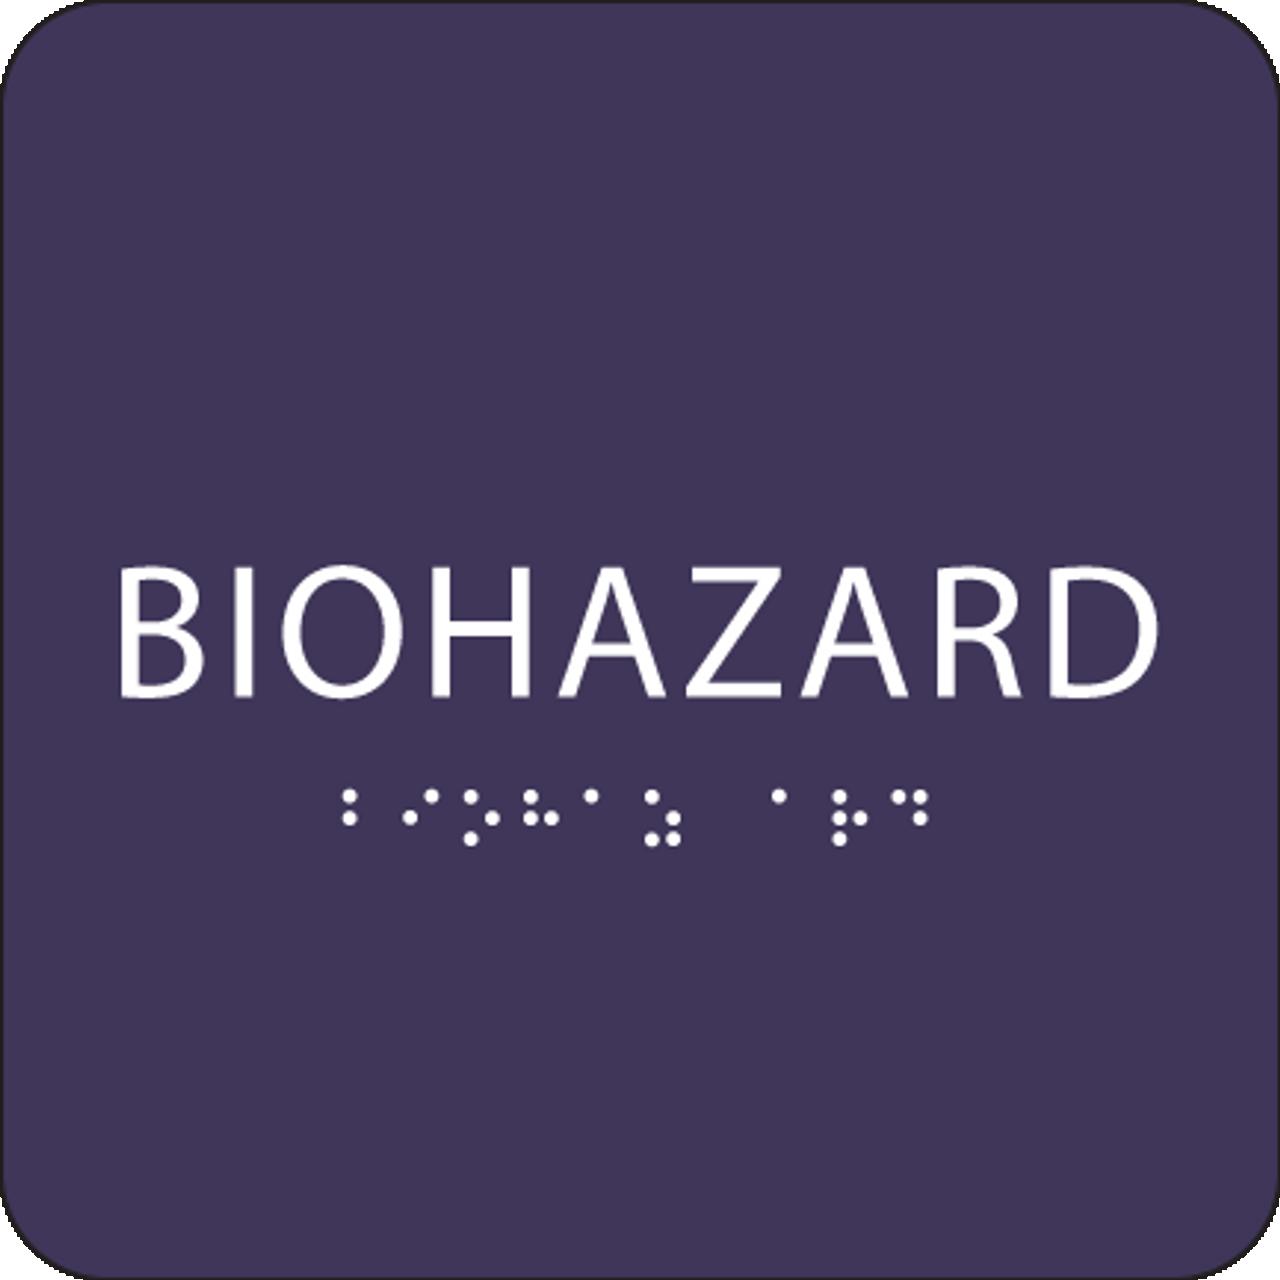 Purple Biohazard ADA Sign